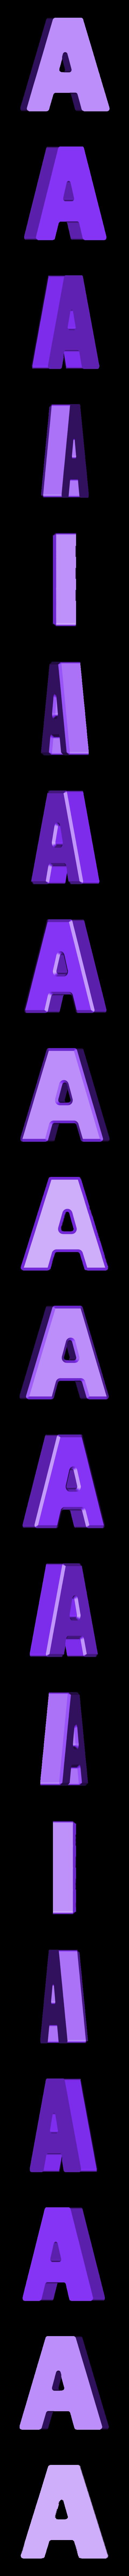 A.stl Download free STL file Letter Bowls • 3D print object, PrintedSolid